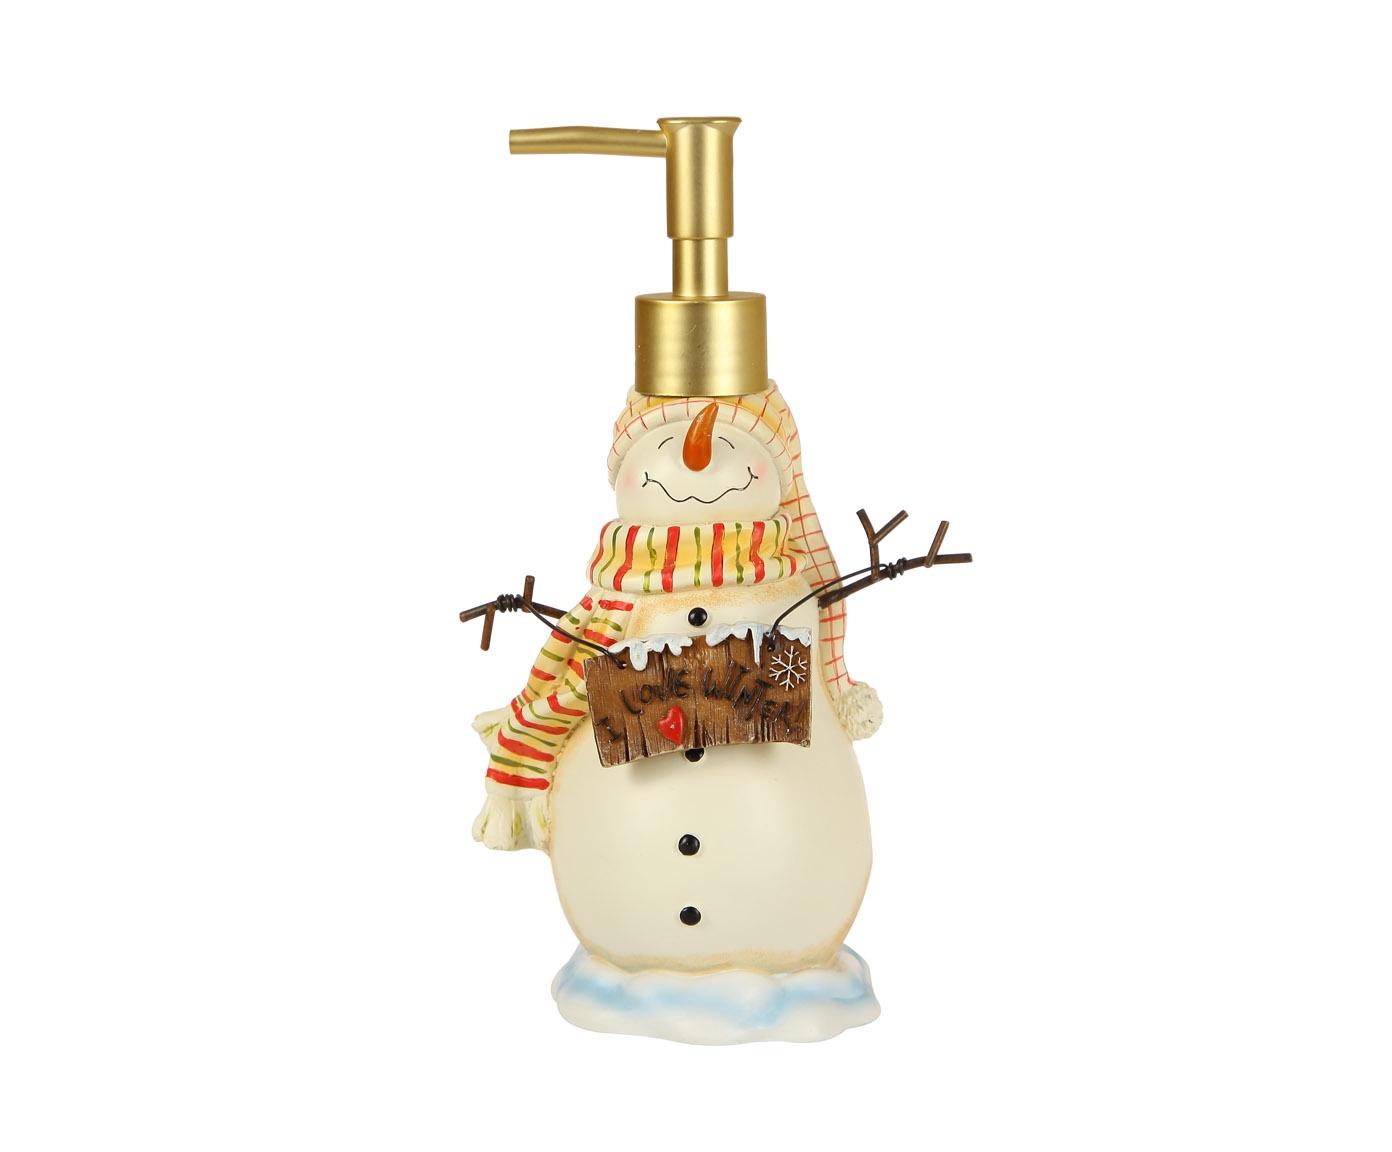 Дозатор для мыла Blonder Home для жидкого мыла дозатор для жидкого мыла king tower цвет серый 12349